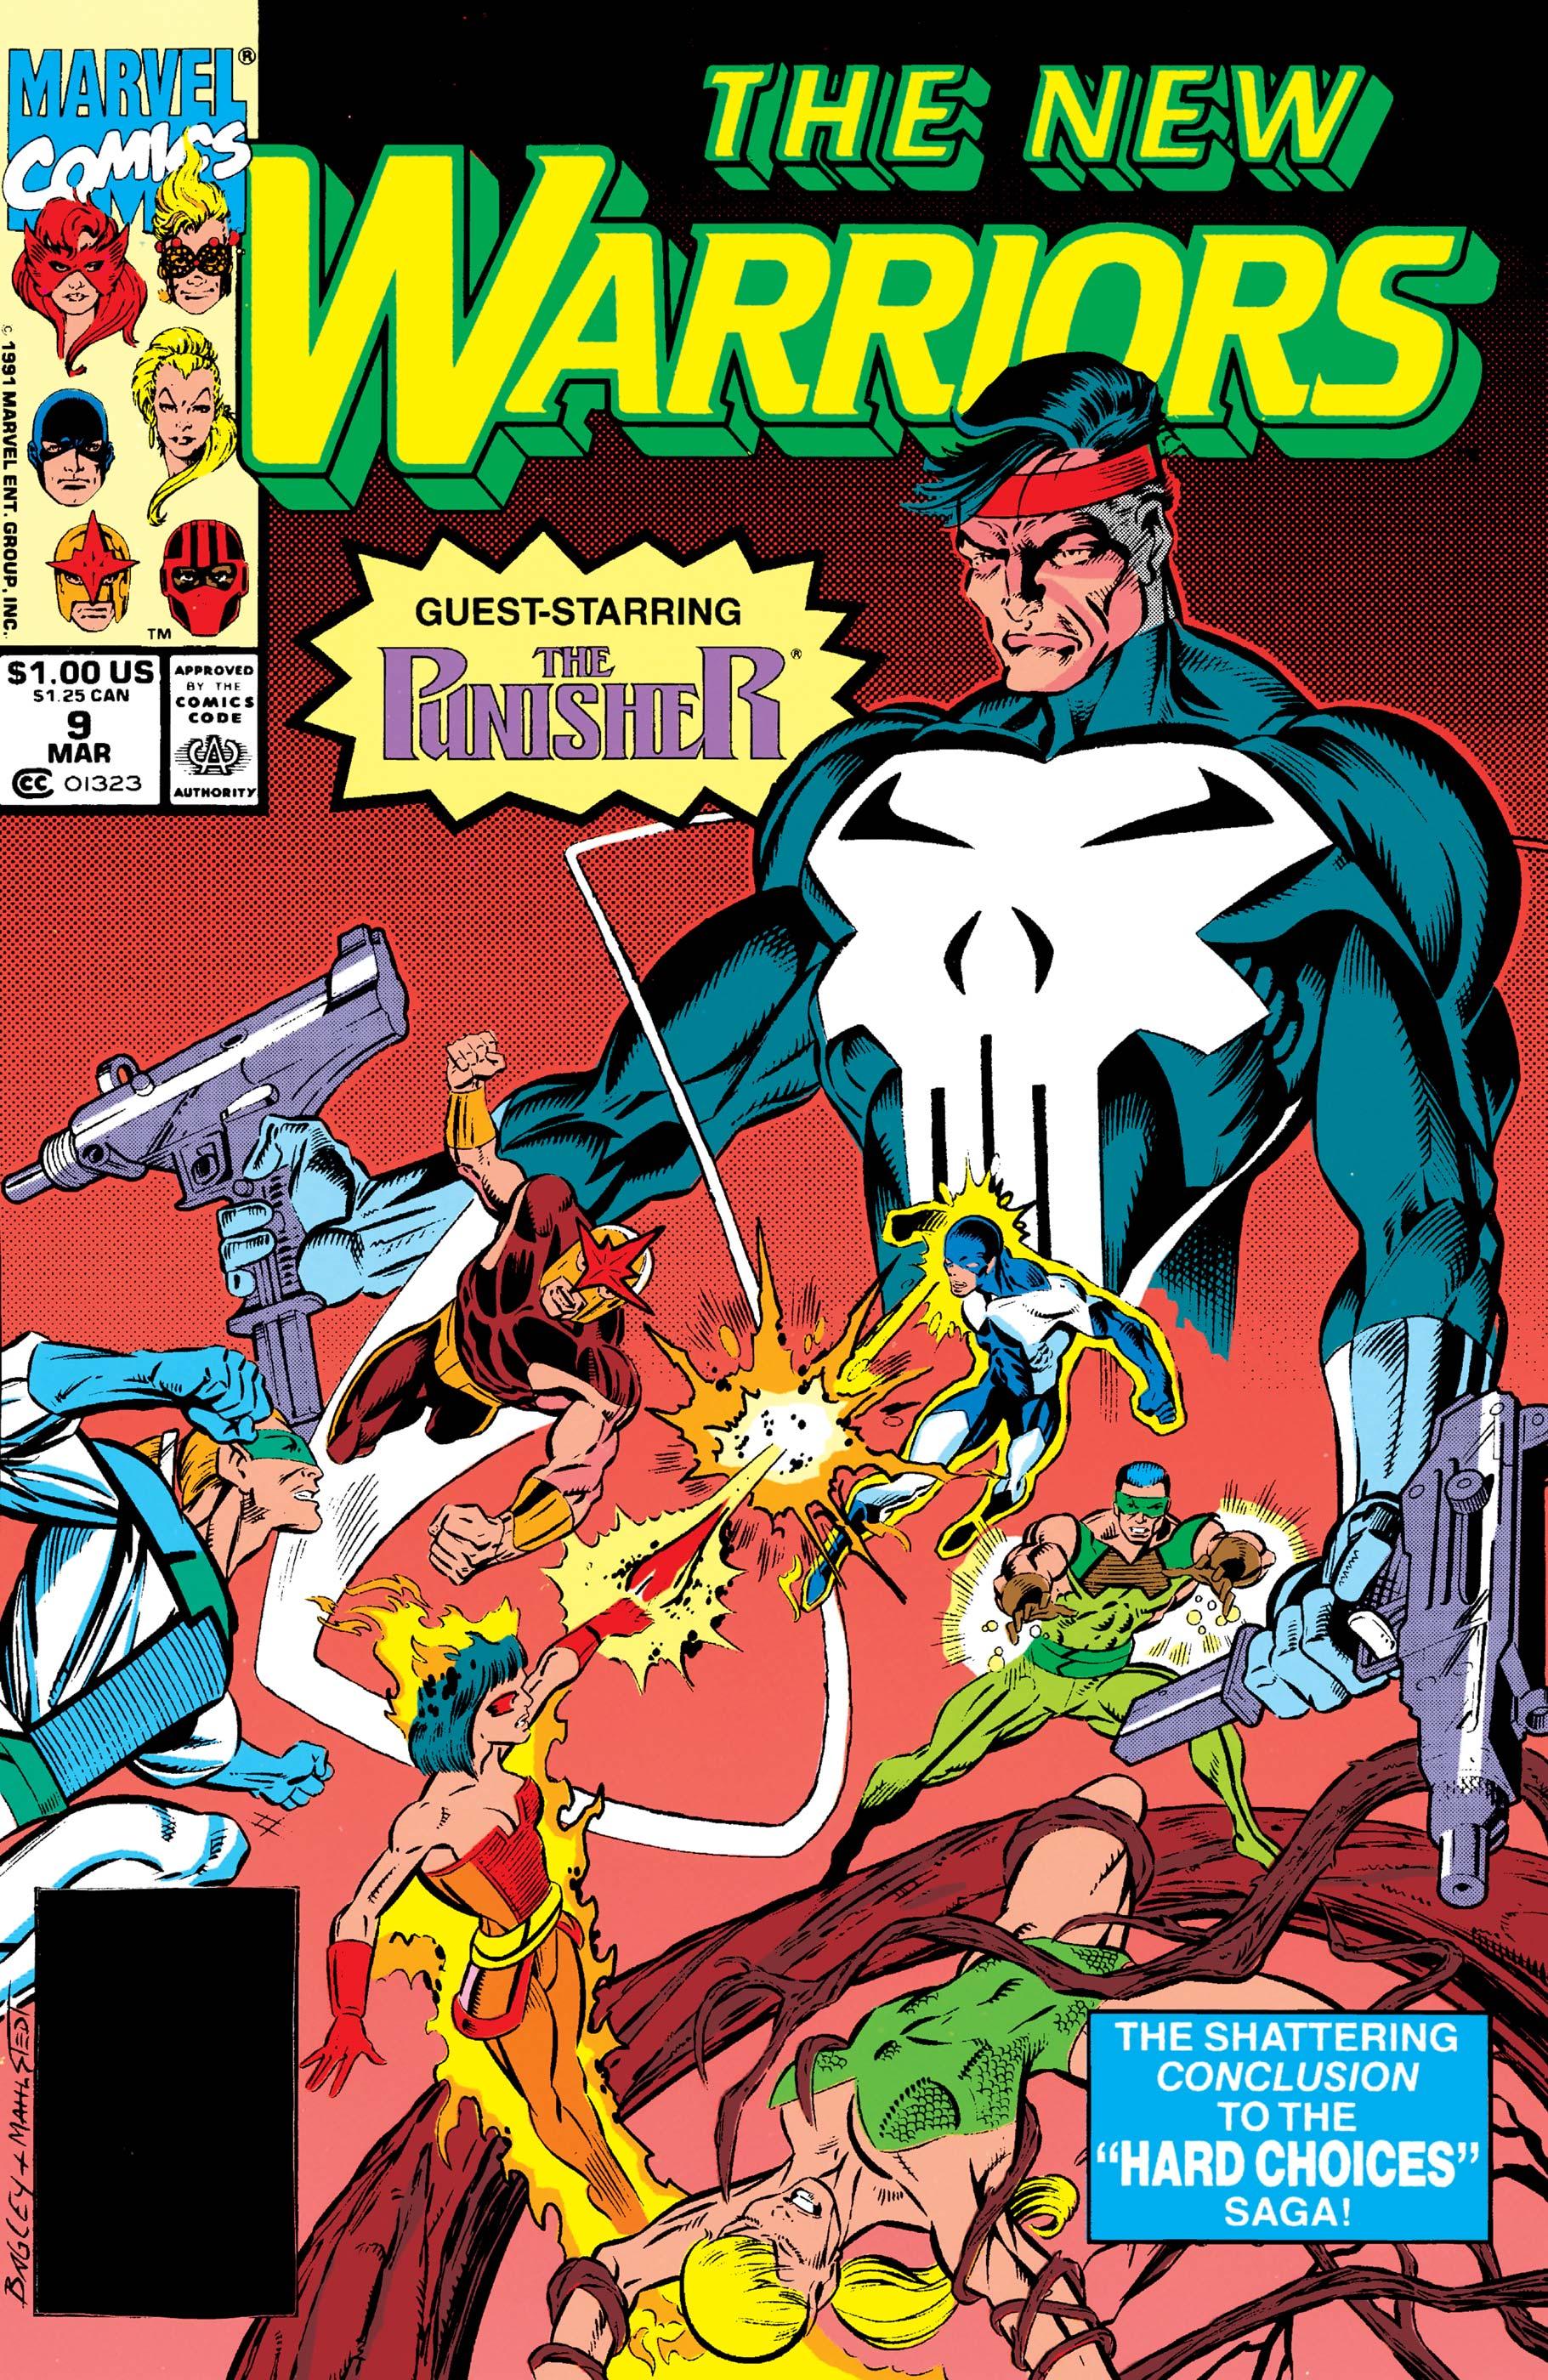 New Warriors (1990) #9